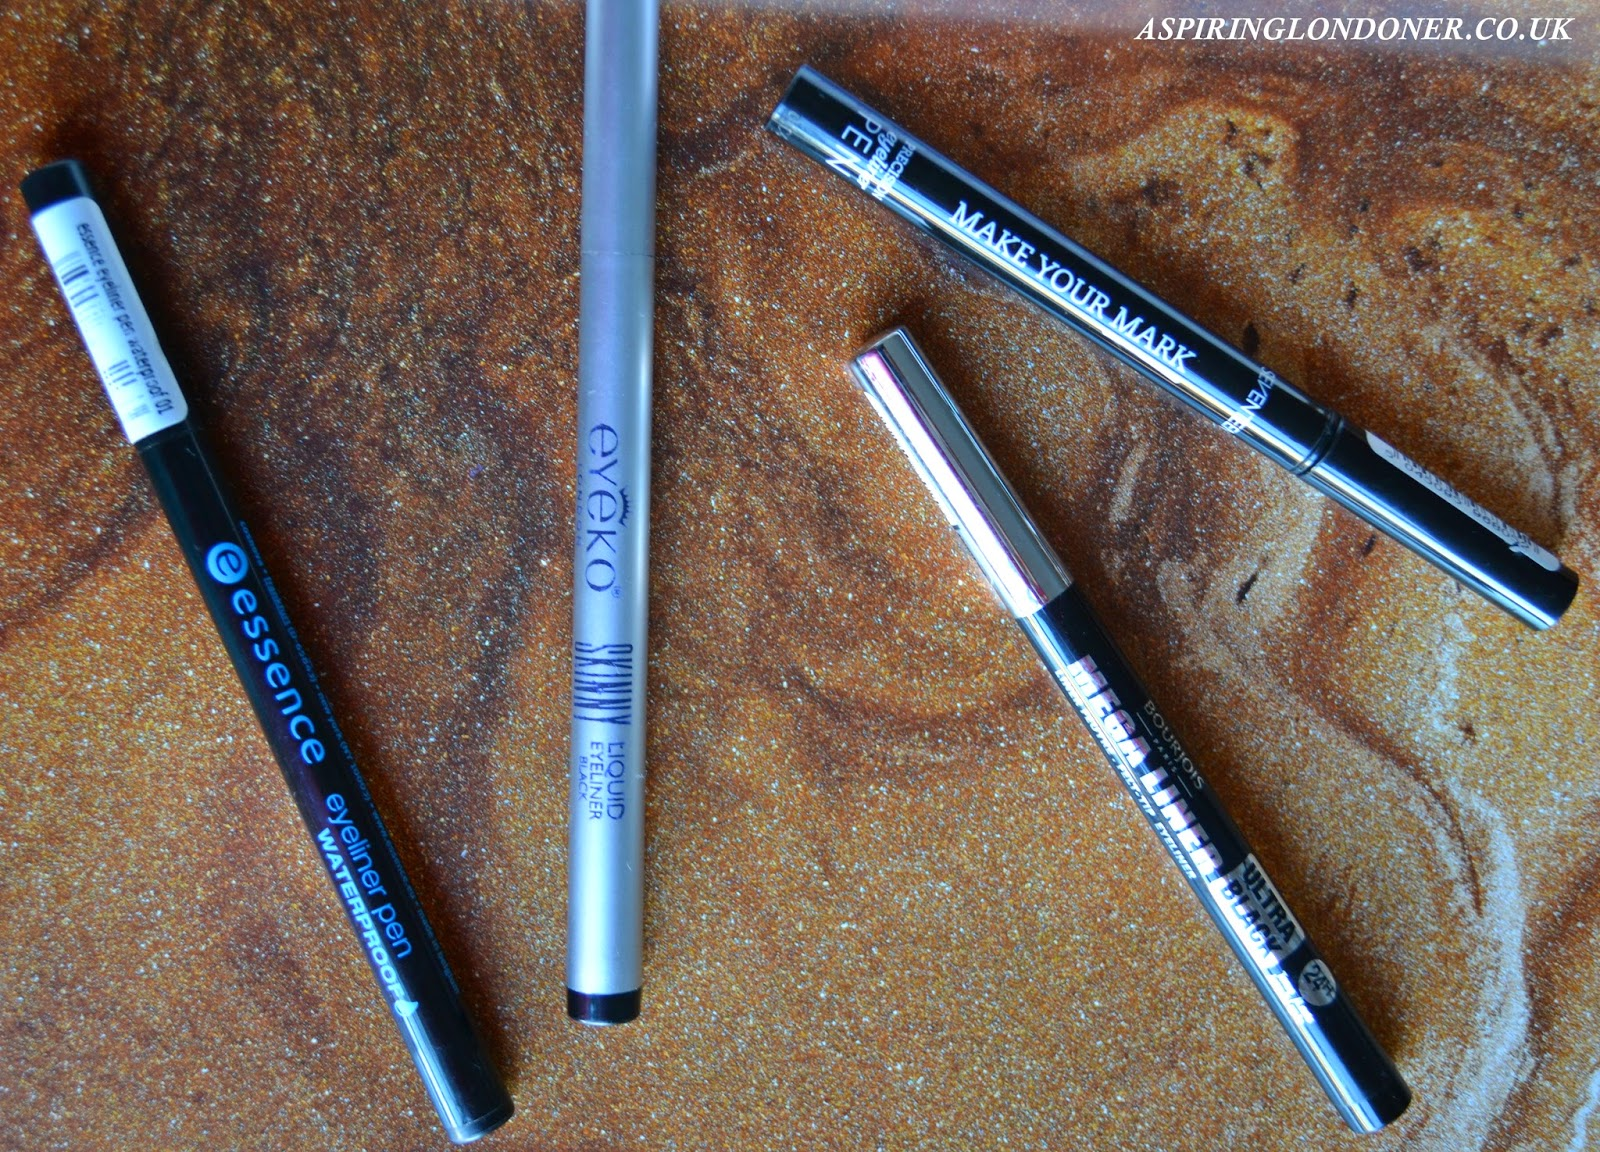 Eyeliner Pens ft Seventeen, Eyeko, Bourjois & Essence - Aspiring Londoner